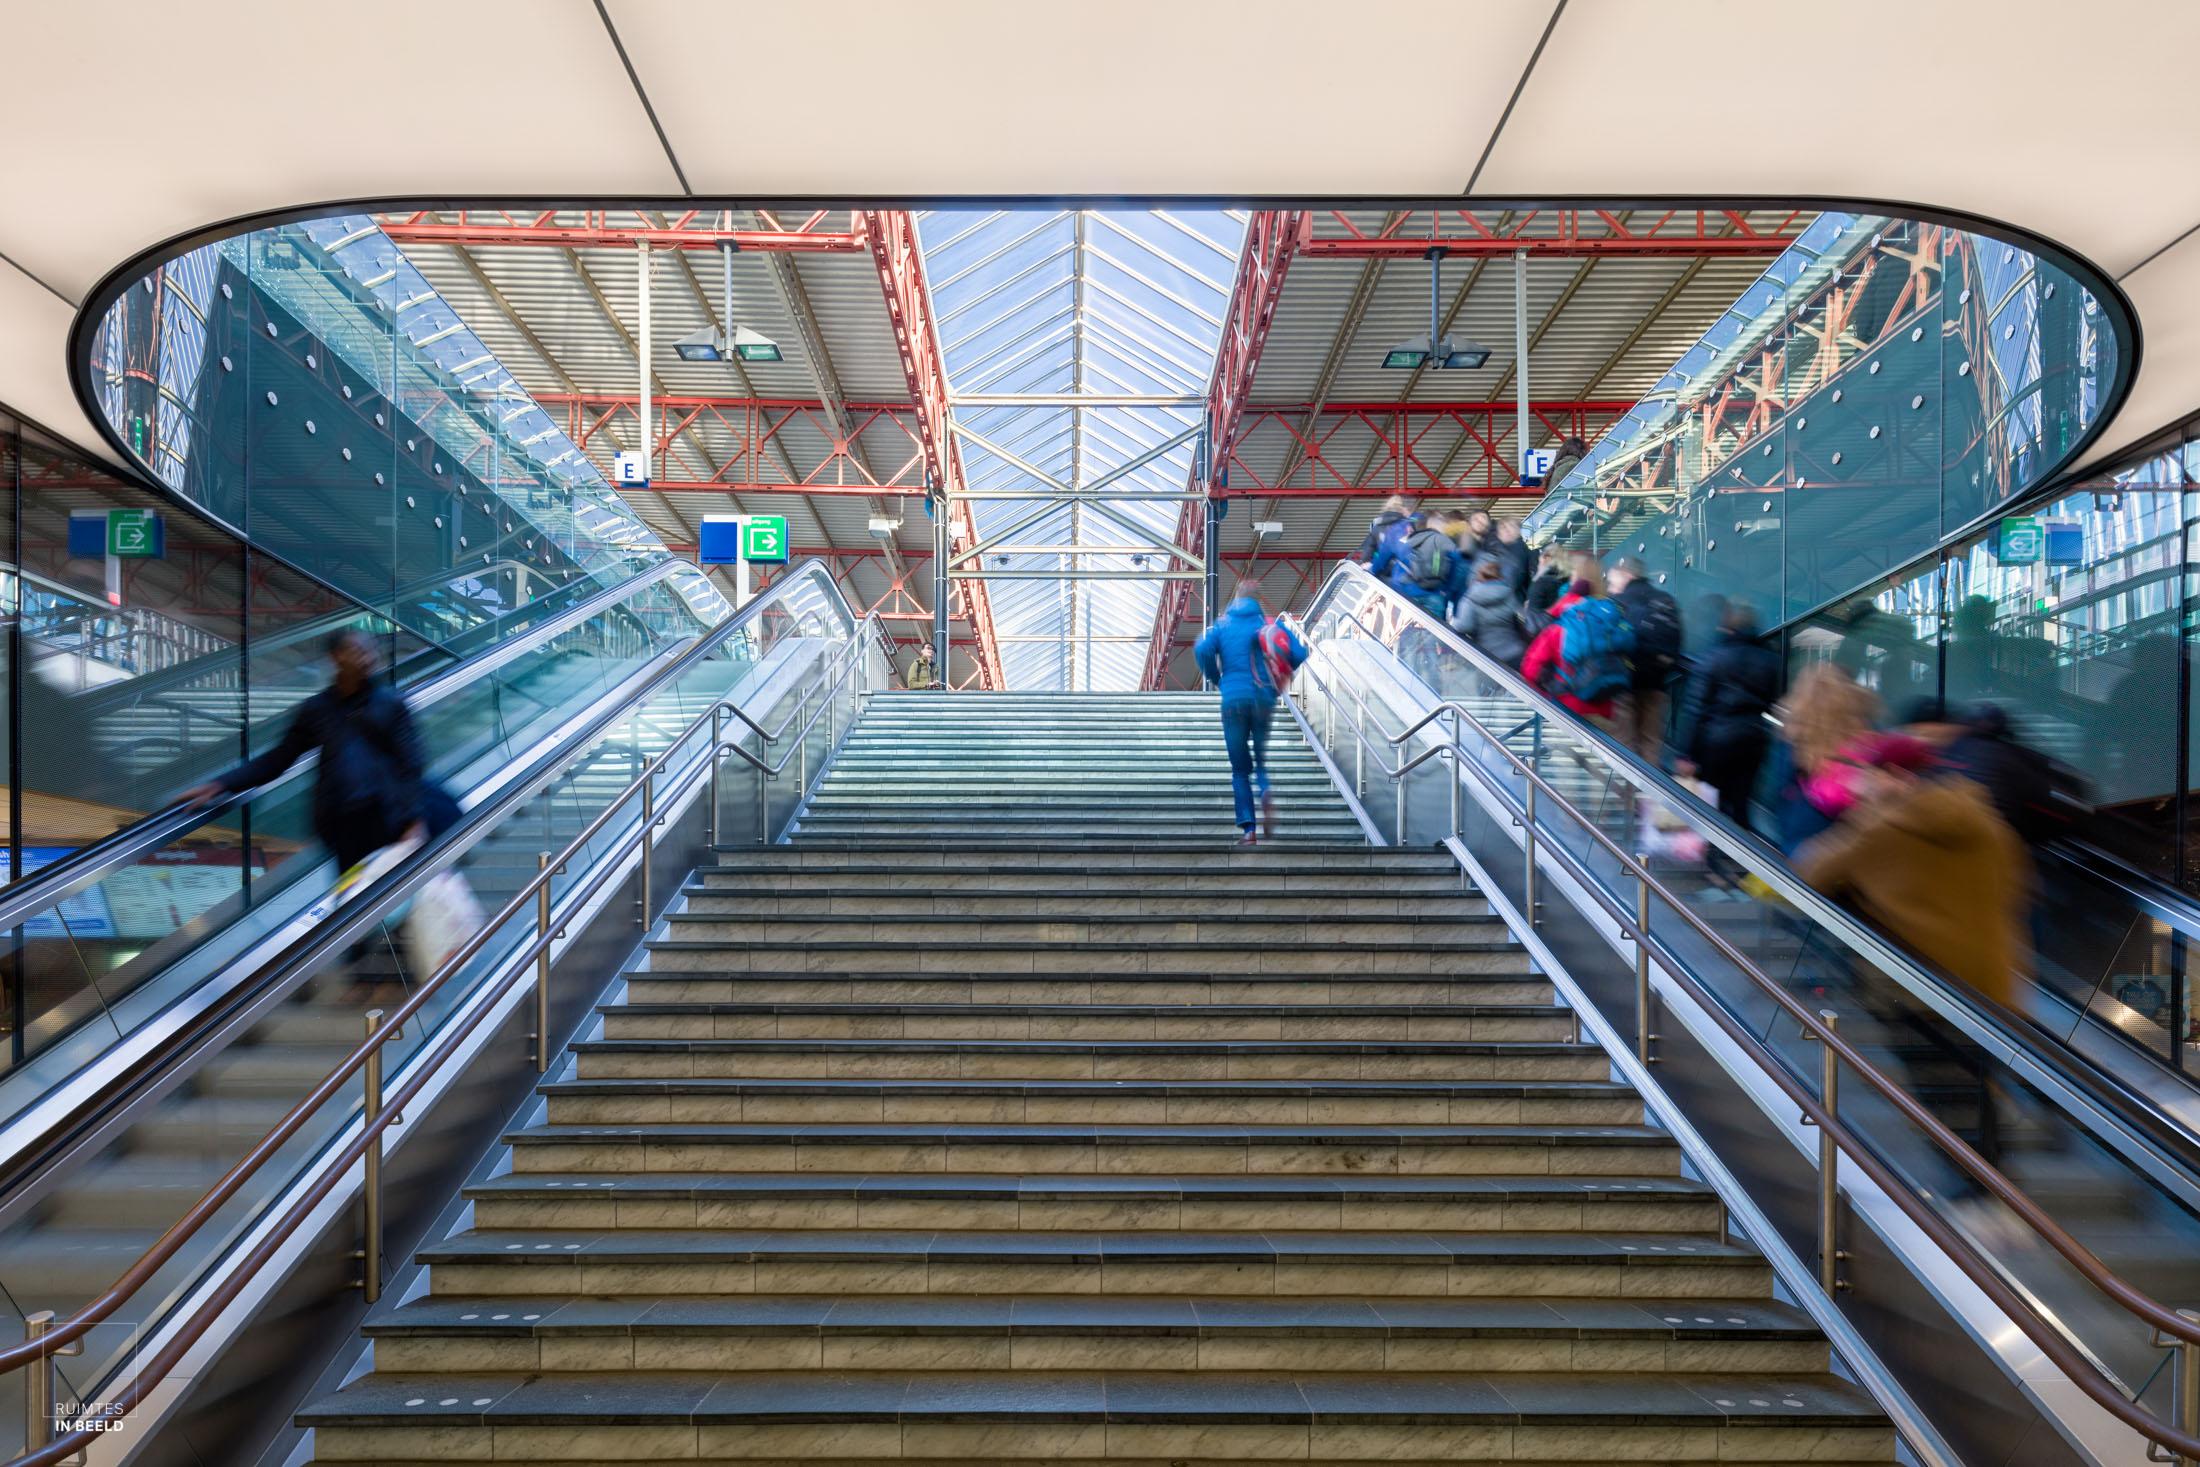 Station-Eindhoven-12.jpg